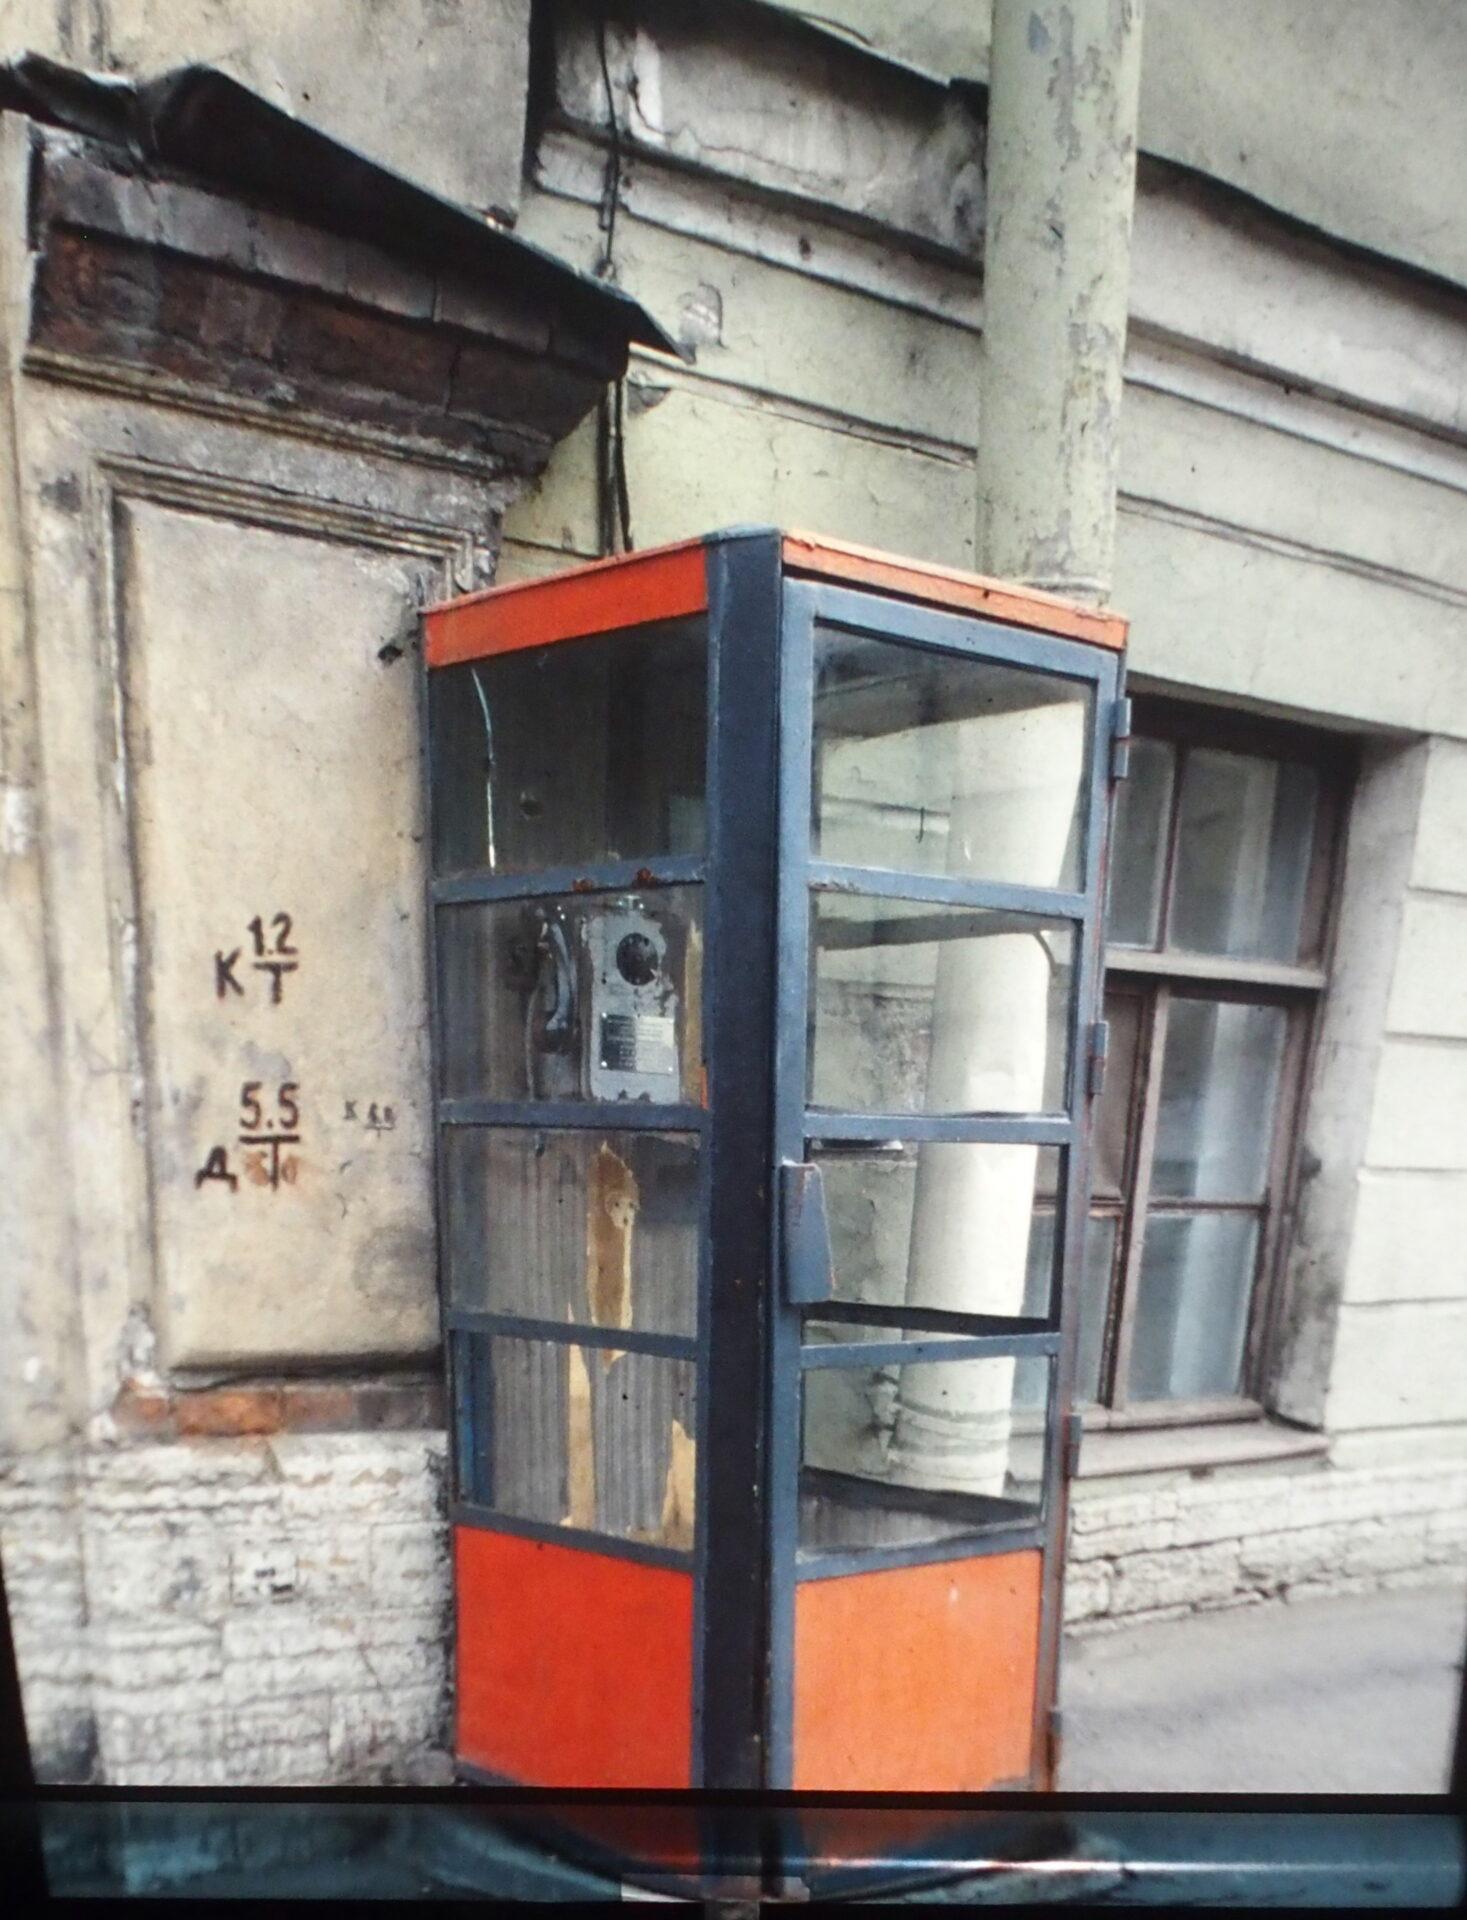 Telefonzelle am Bahnhof,noch aktiv?